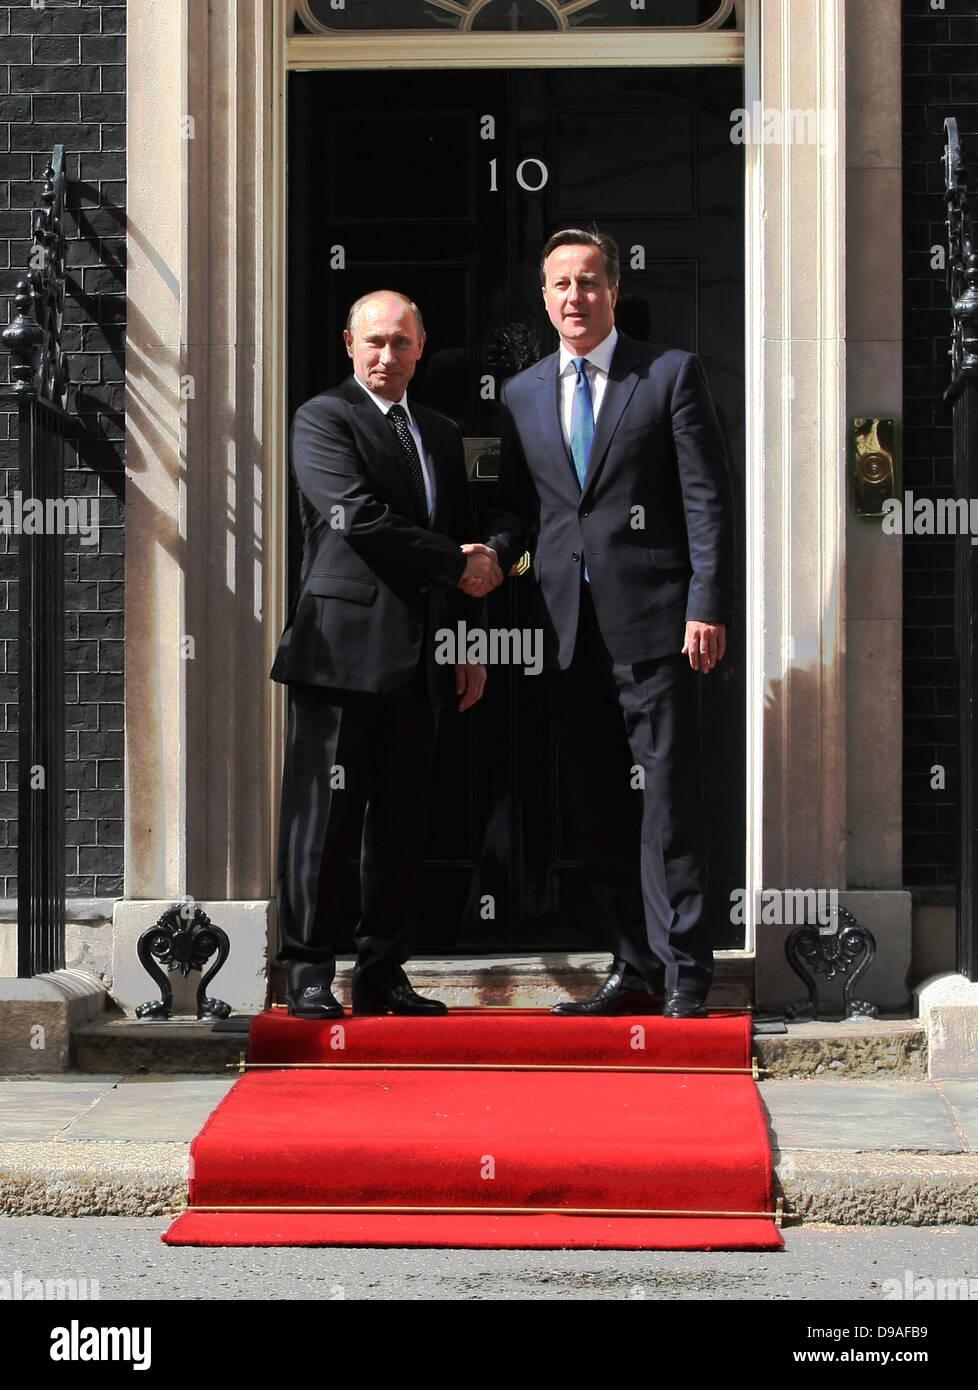 VLADIMIR PUTIN & DAVID CAMERON RUSSIAN PRESIDENT AND BRITISH 16 June 2013 10 DOWNING STREET  LONDON ENGLAND Stock Photo